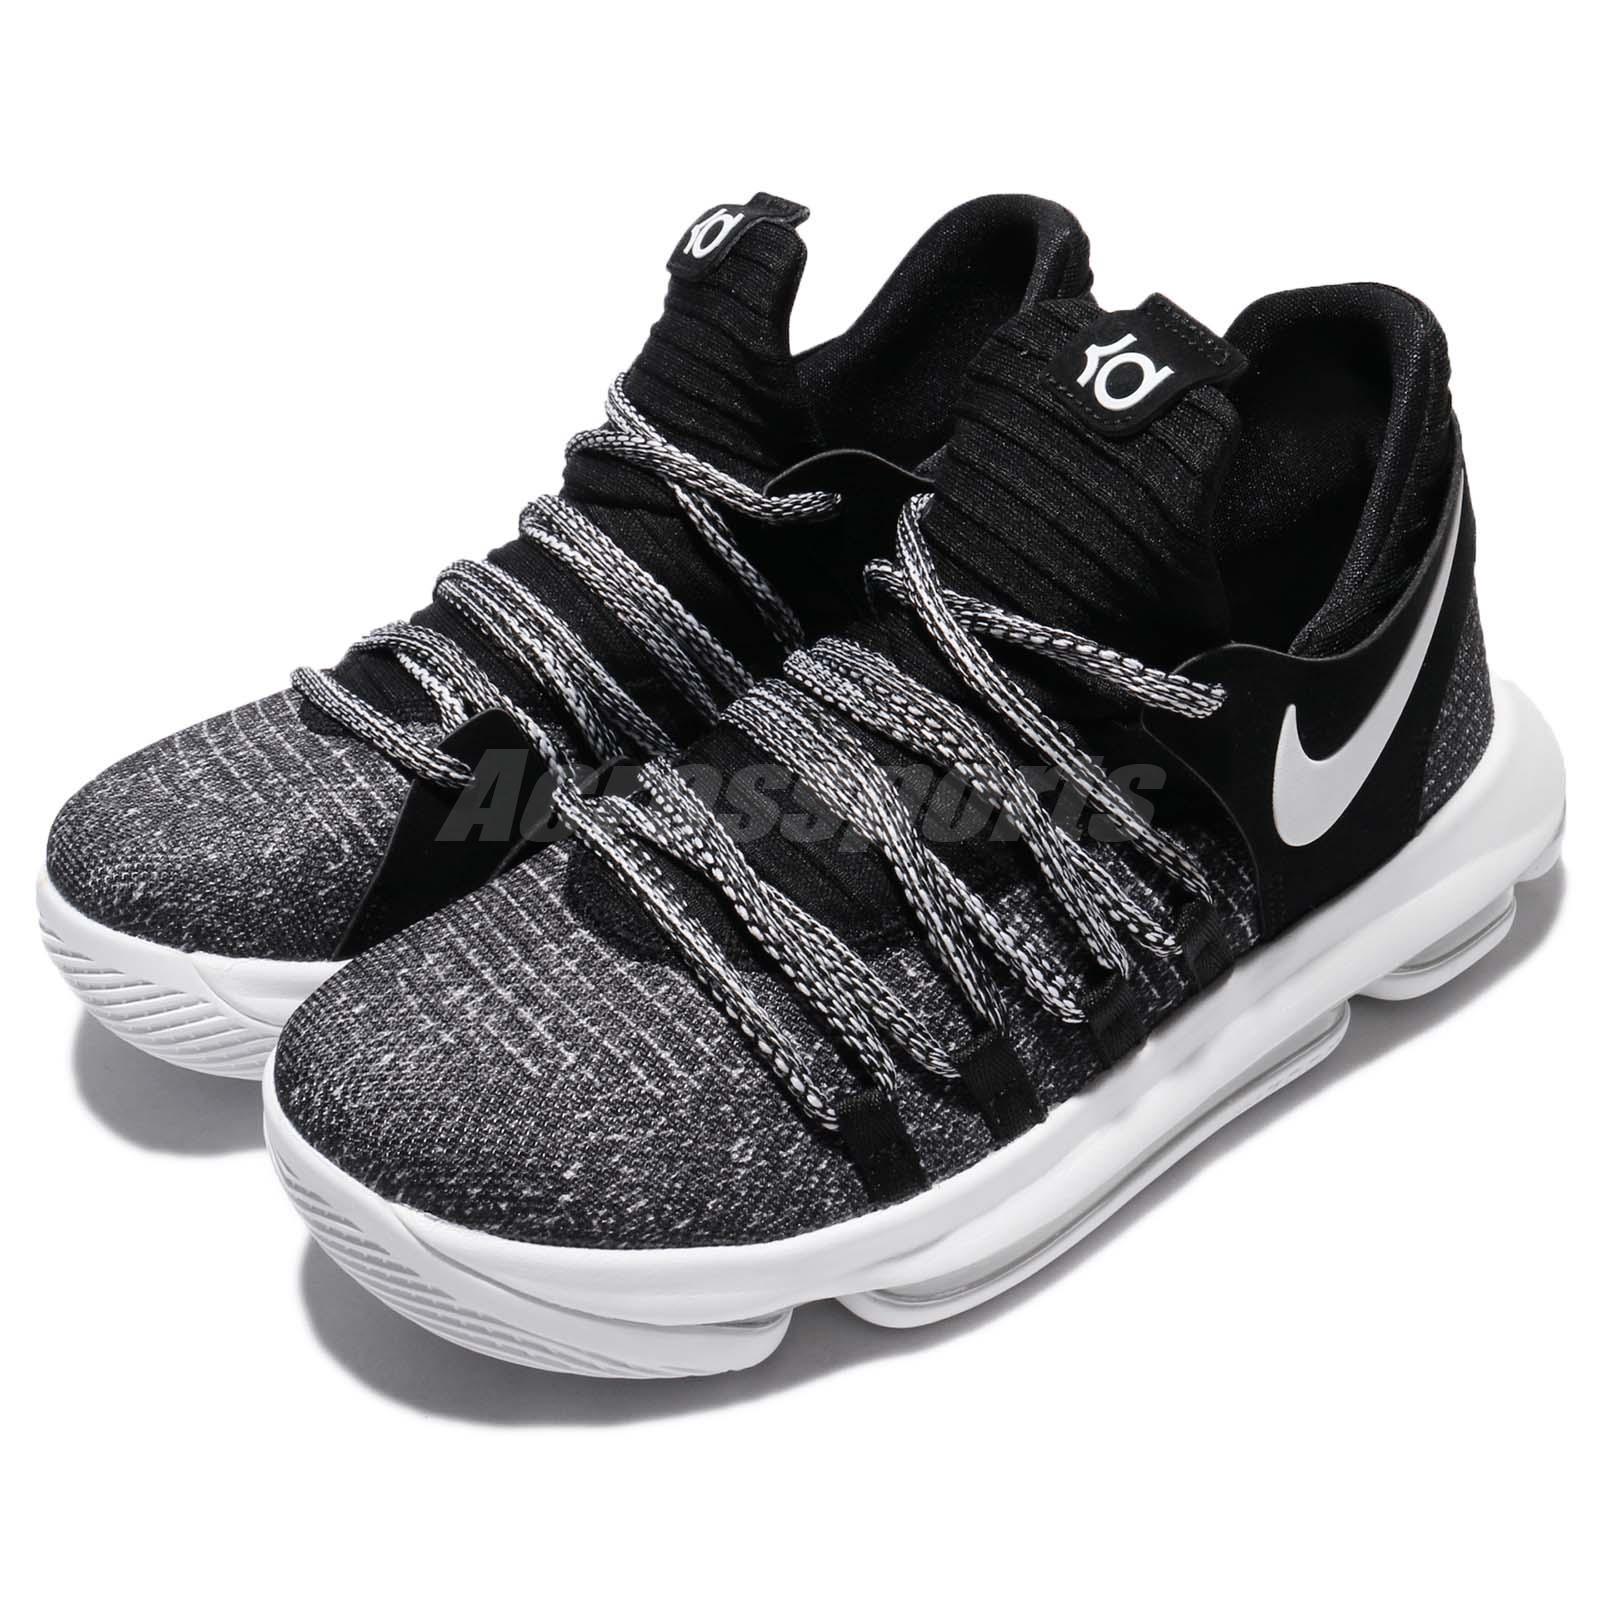 sale retailer 00cb6 b618d Nike Zoom KD10 GS X Oreo Black KDX Kevin Durant Men Basketba